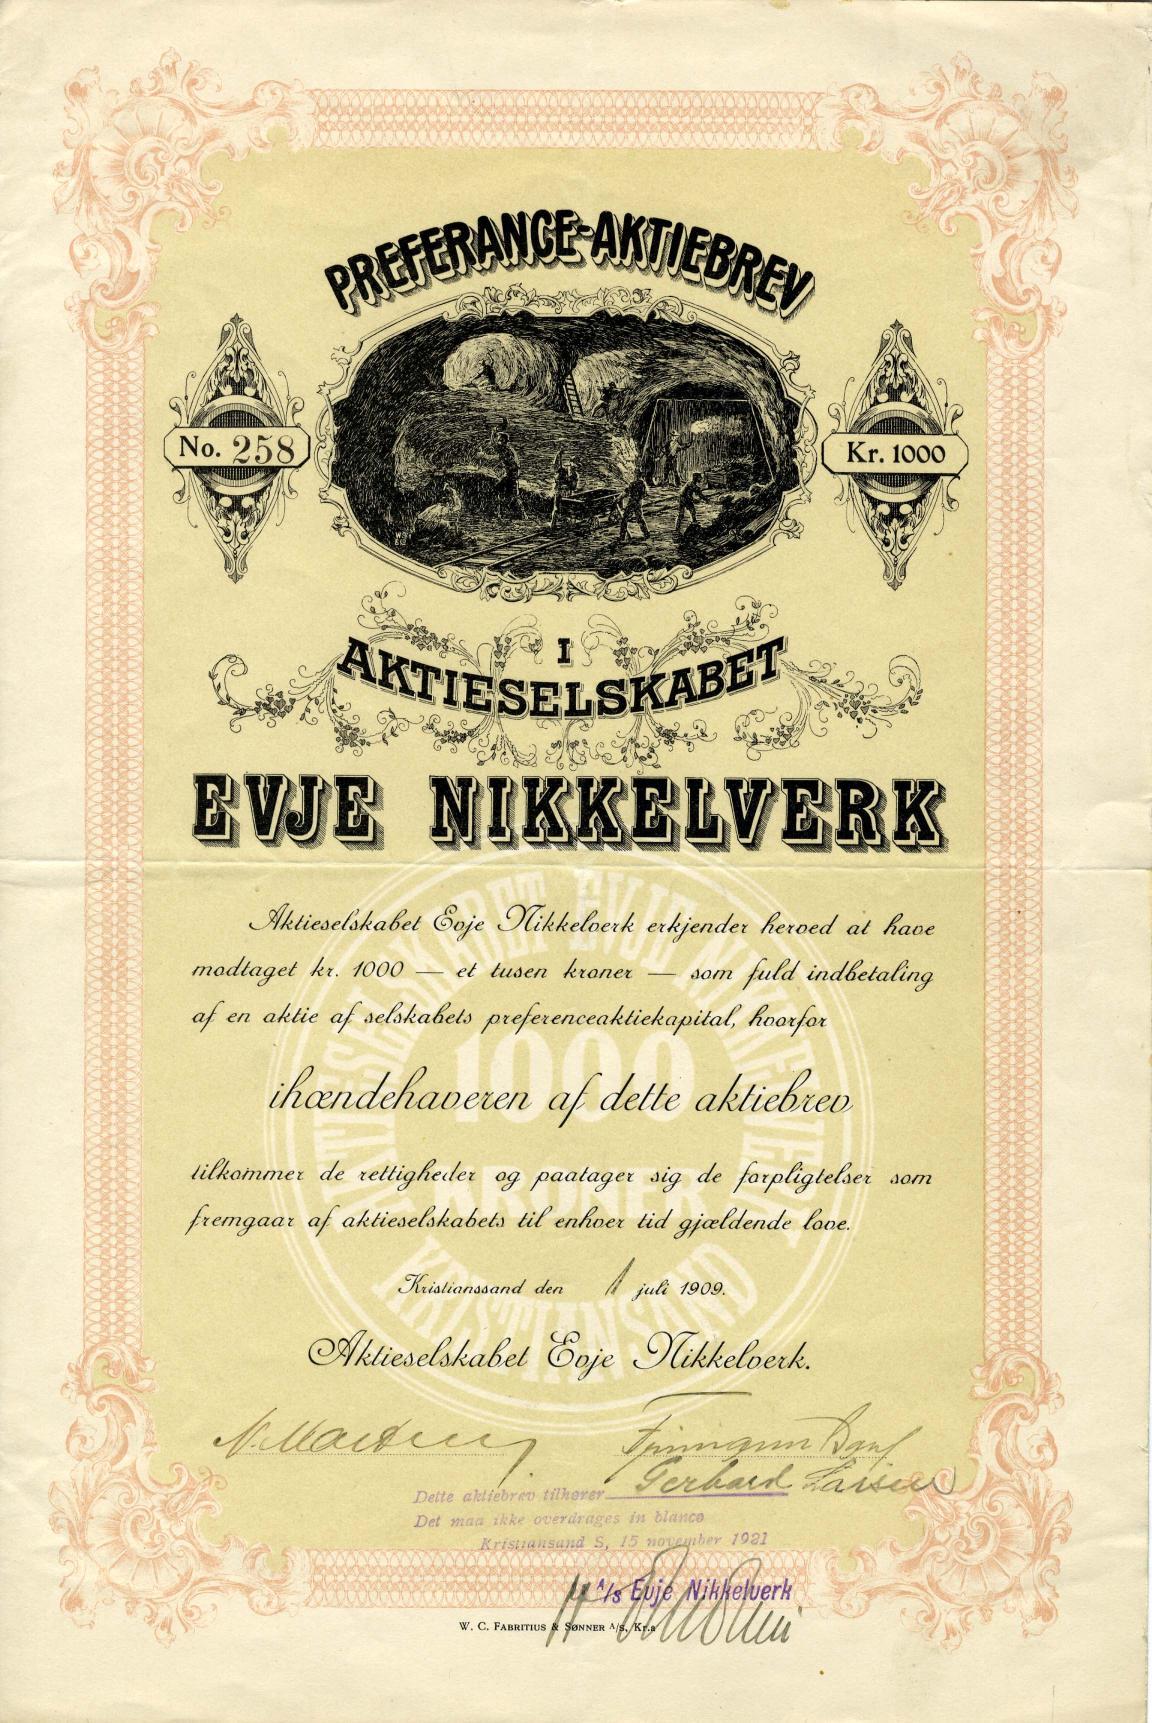 evje-nikkelverk_1909_1000